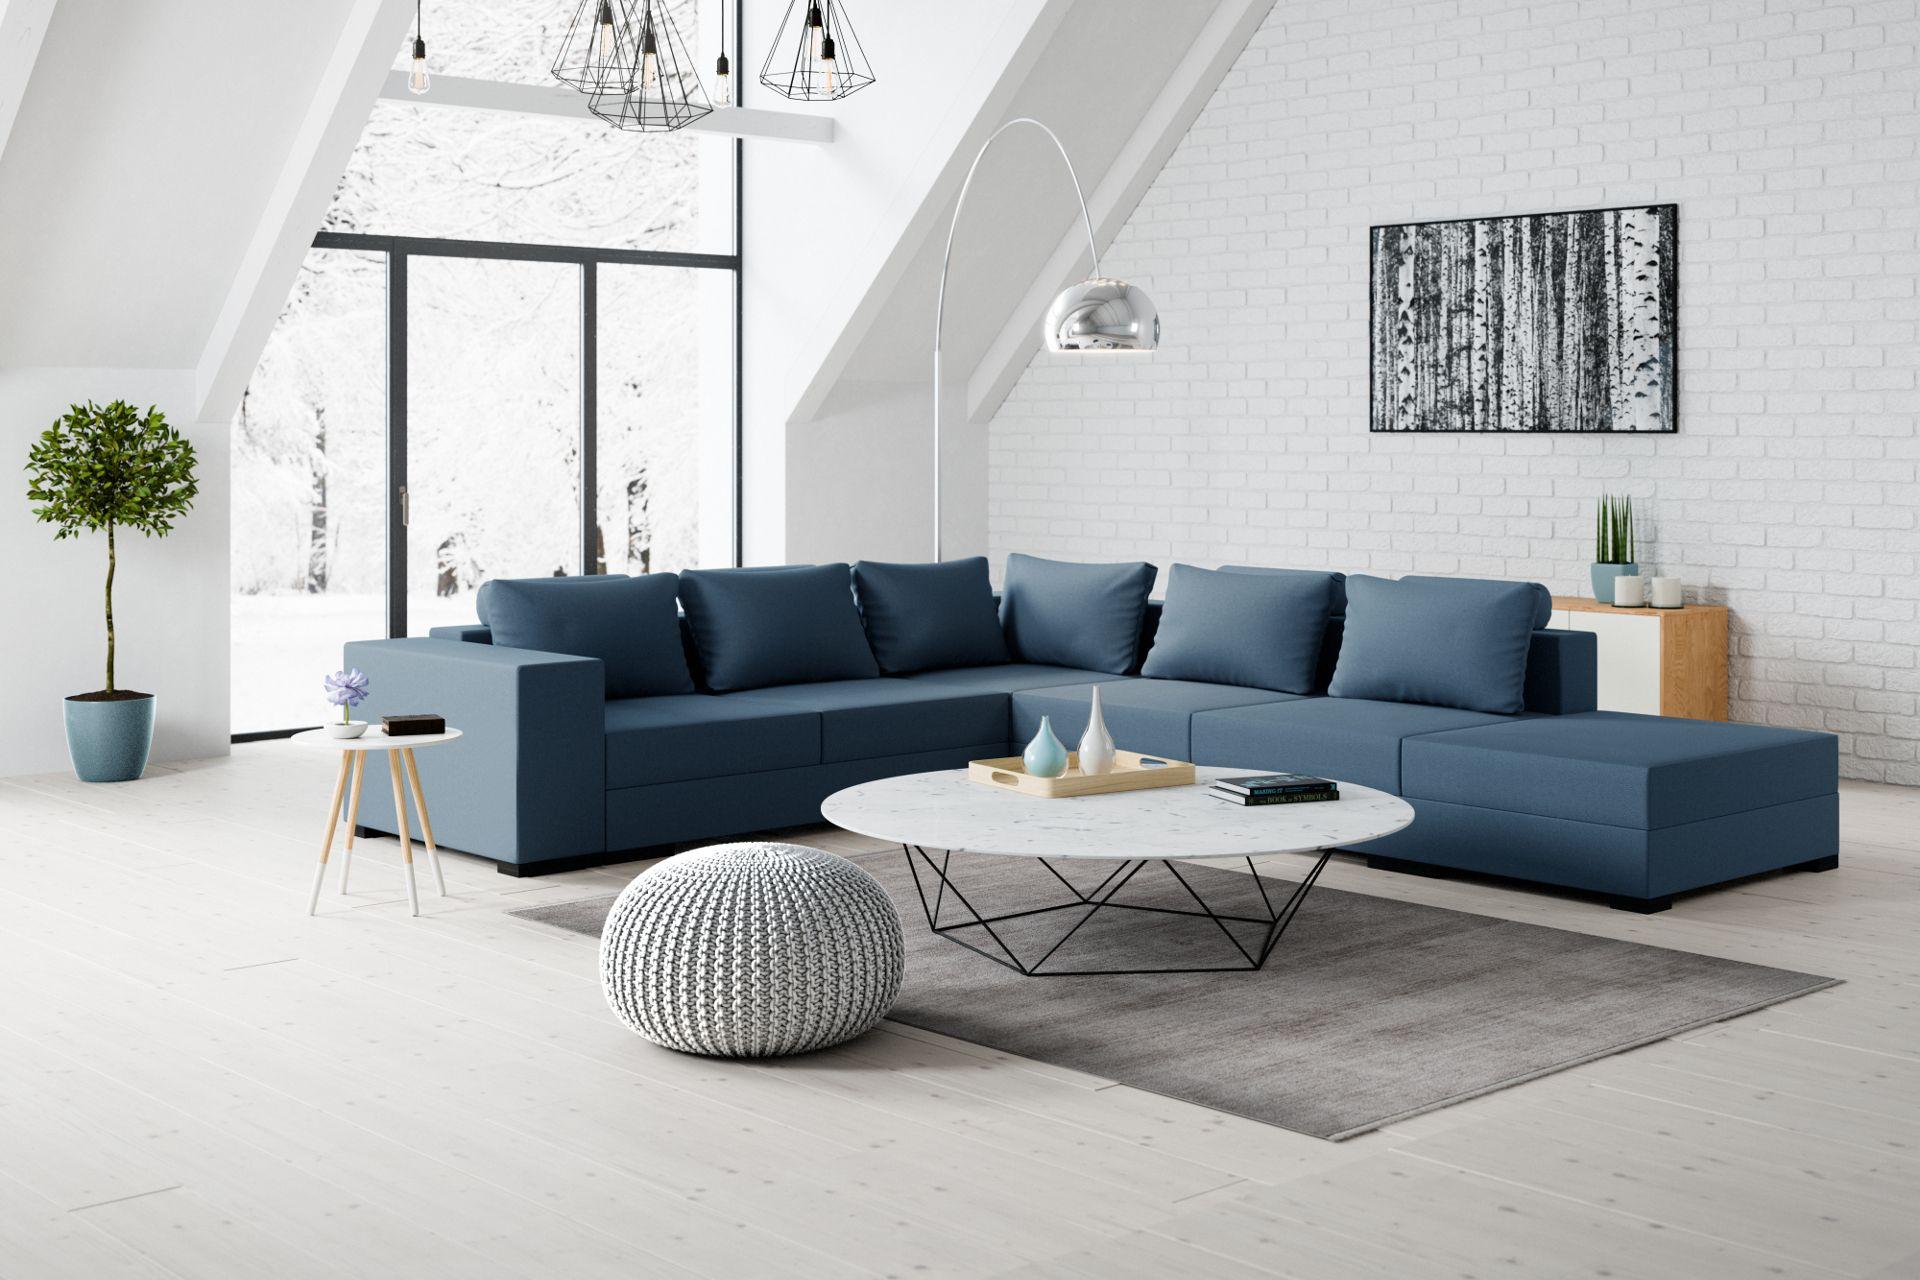 Handmade and tailor-made, Italian-style furniture by Vamosi Milan ...